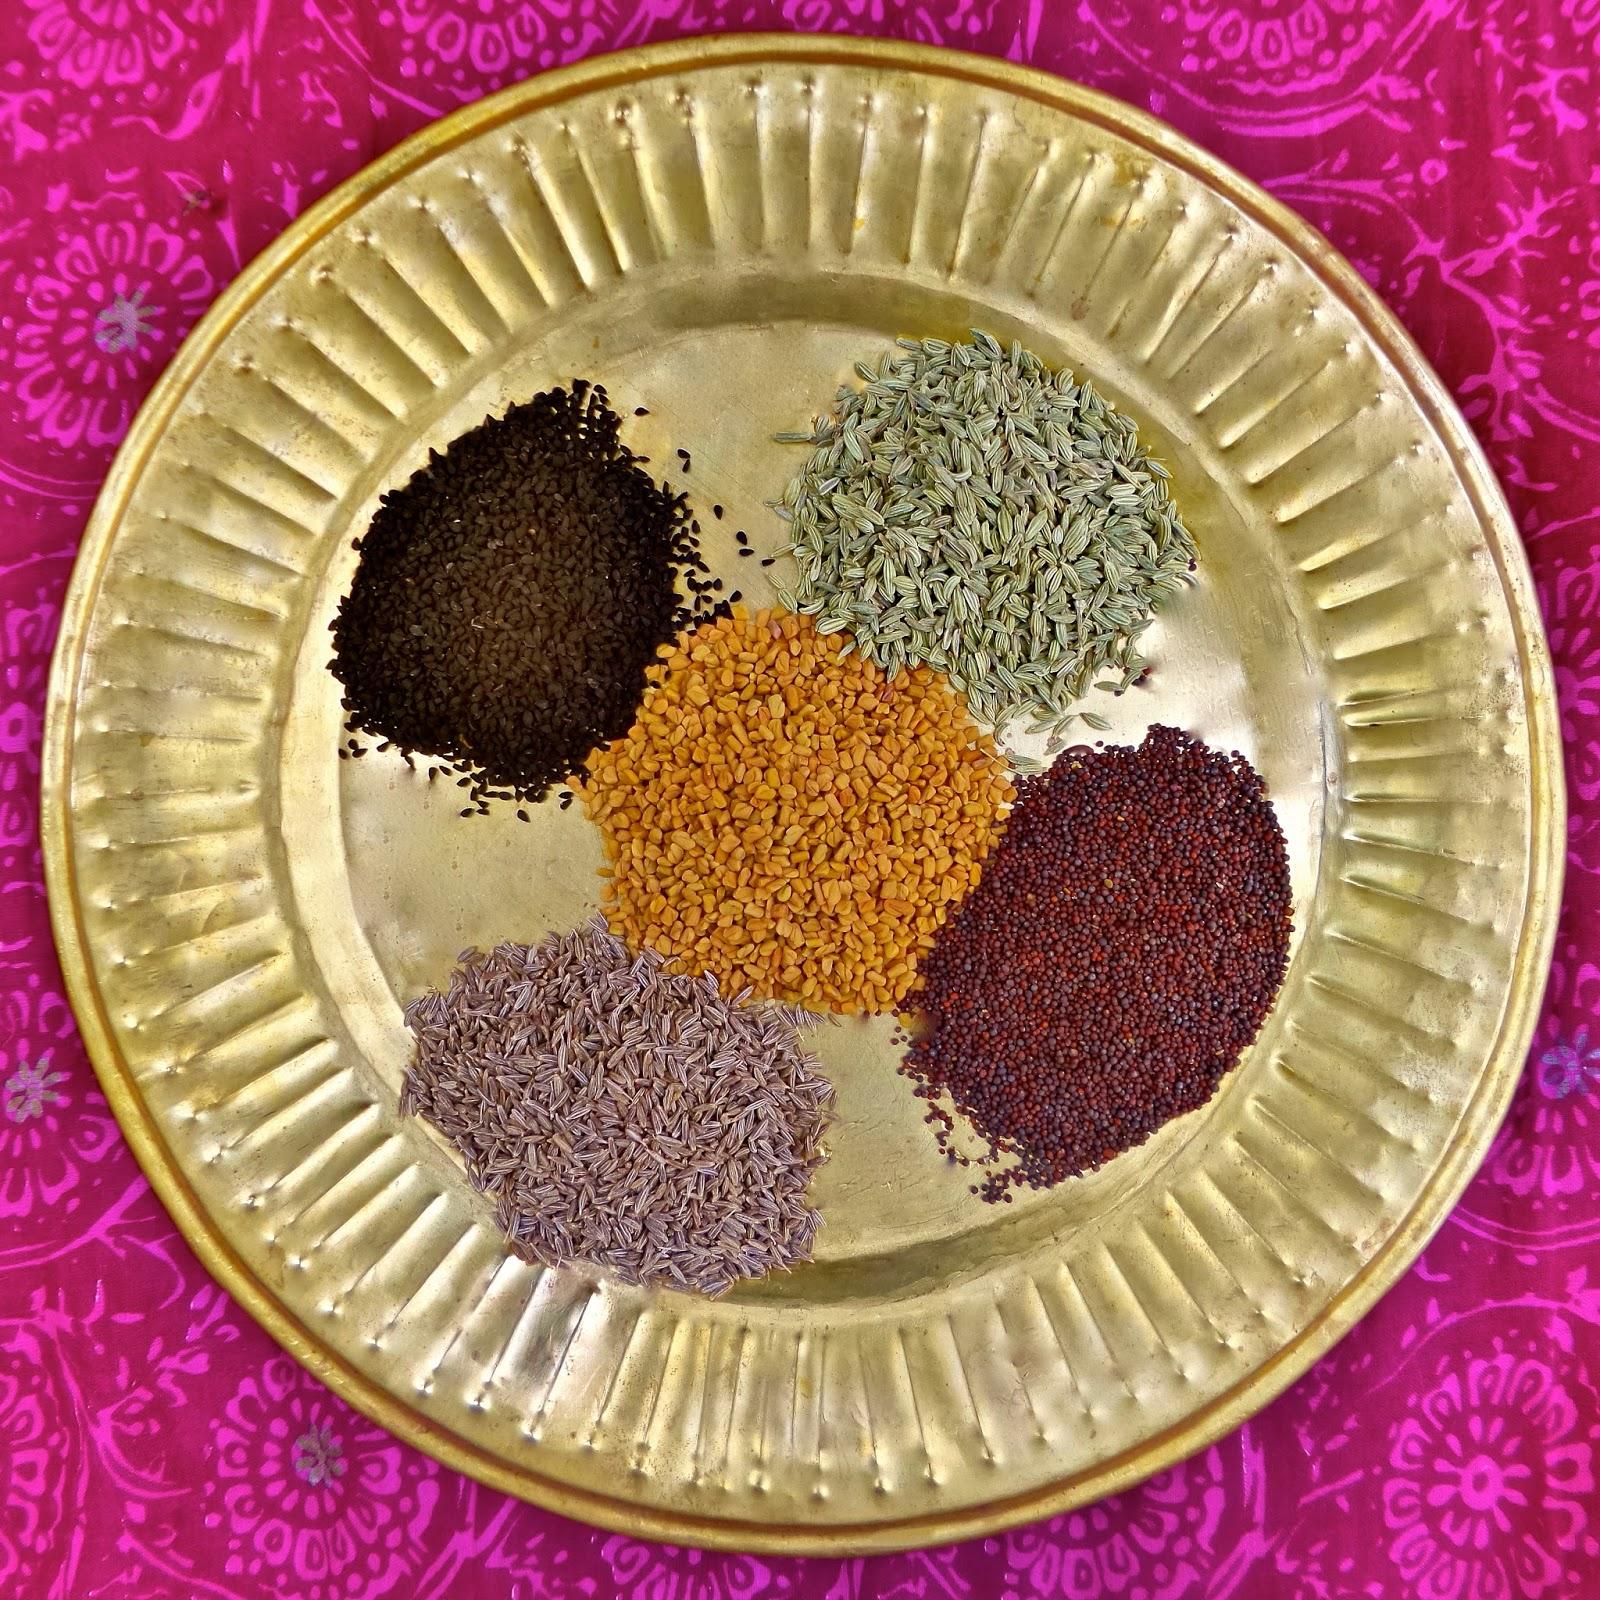 panch phoron, panch puran, panch phutana,  panch phoran,  panch pora, fennel, fenugreek, cumin, radhuni, ajmod, mustard, nigella, kalonji, bengal, bengali, indian, five spice, bengali five spice,